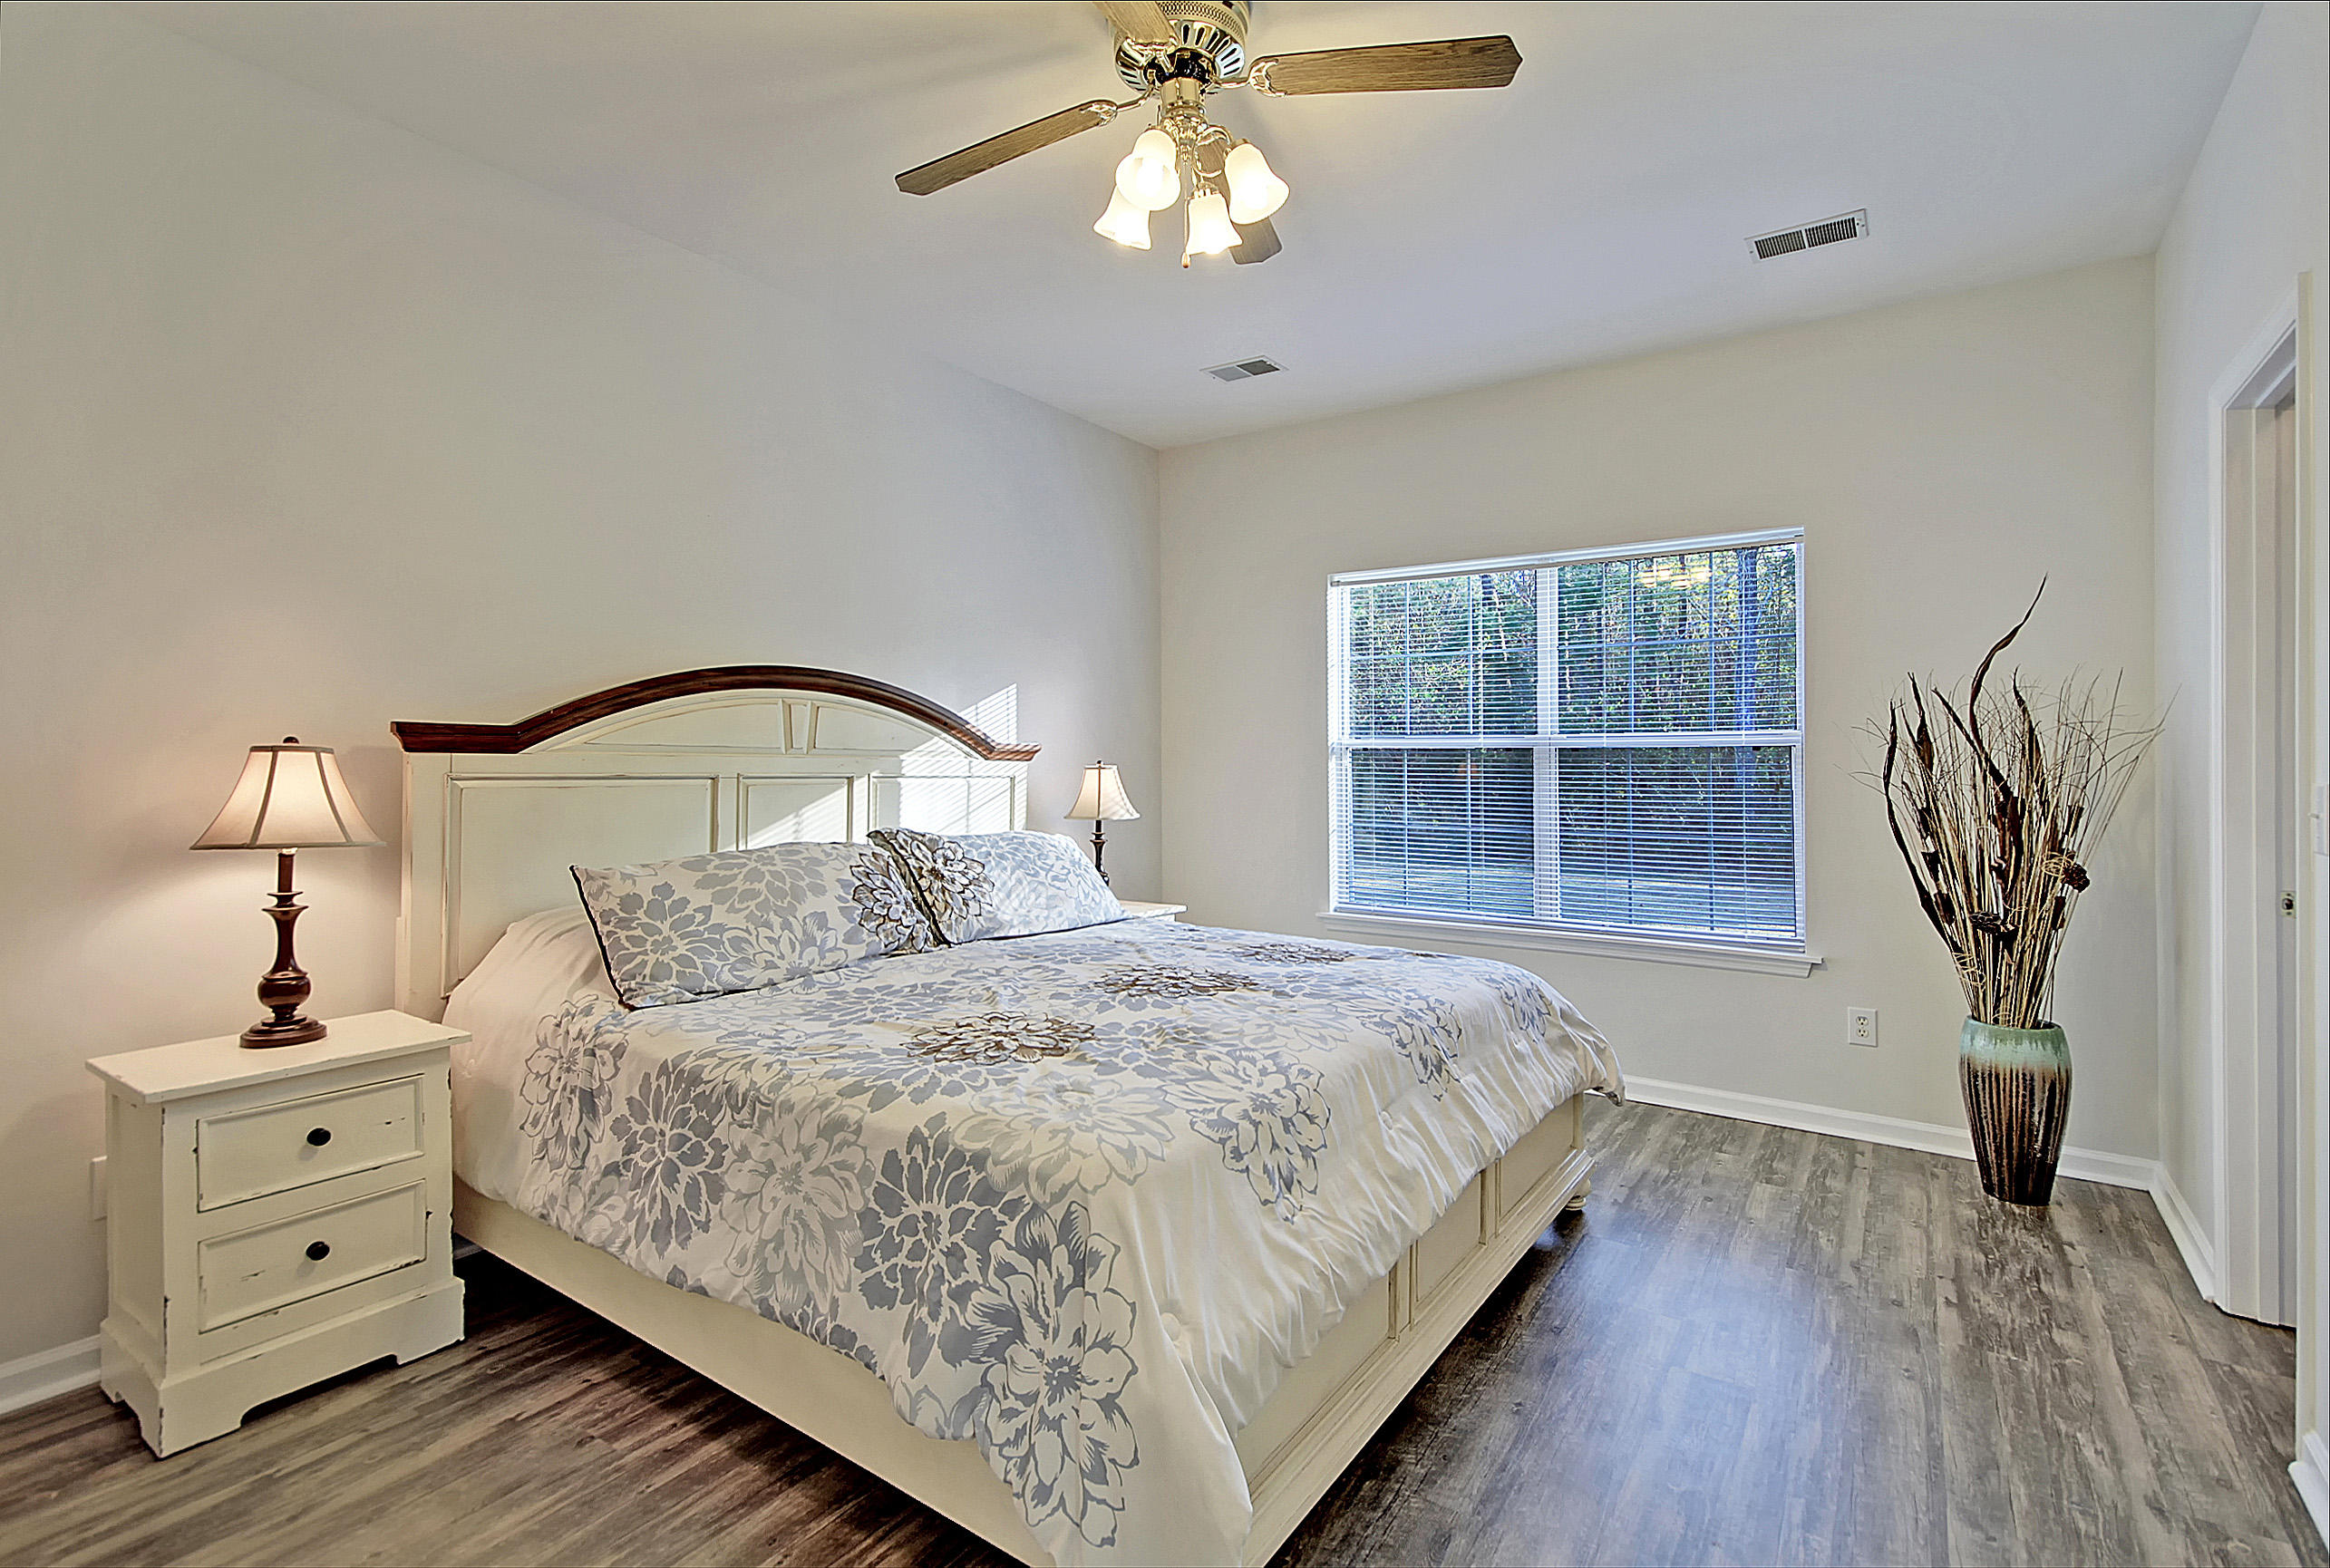 Dunes West Homes For Sale - 2656 Palmetto Hall, Mount Pleasant, SC - 26